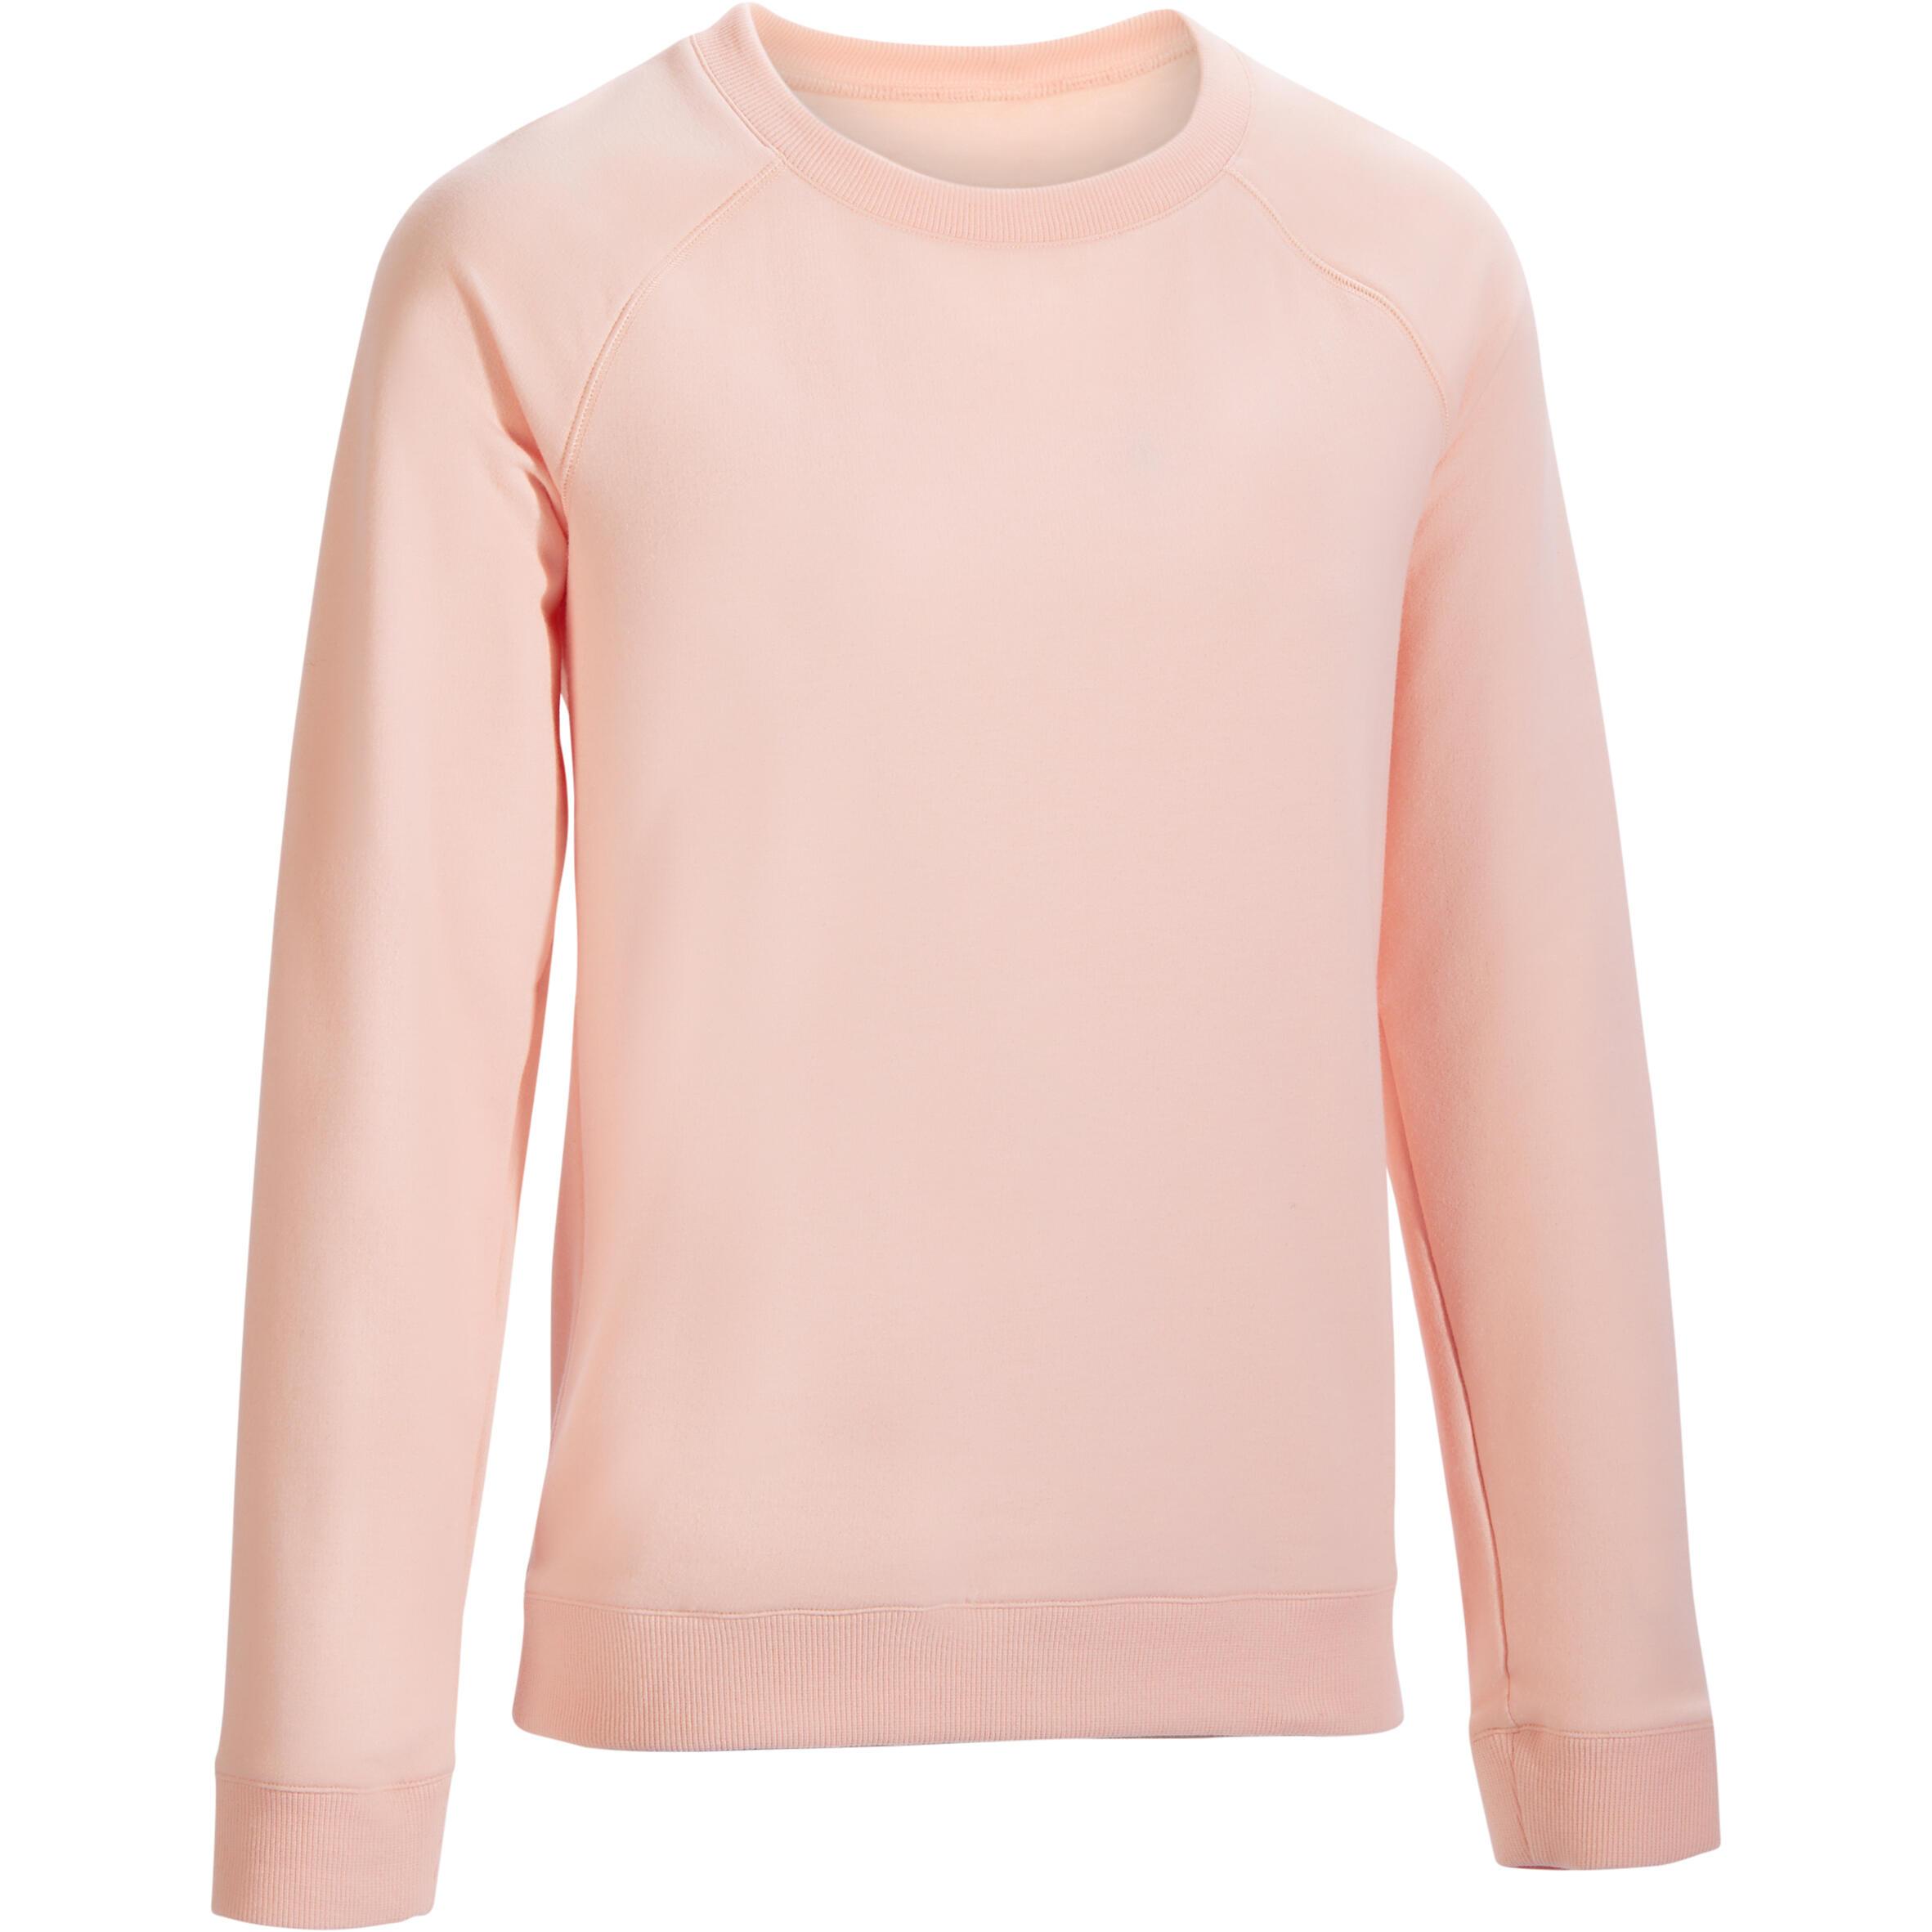 500 Women's Stretching Sweatshirt - Light Pink